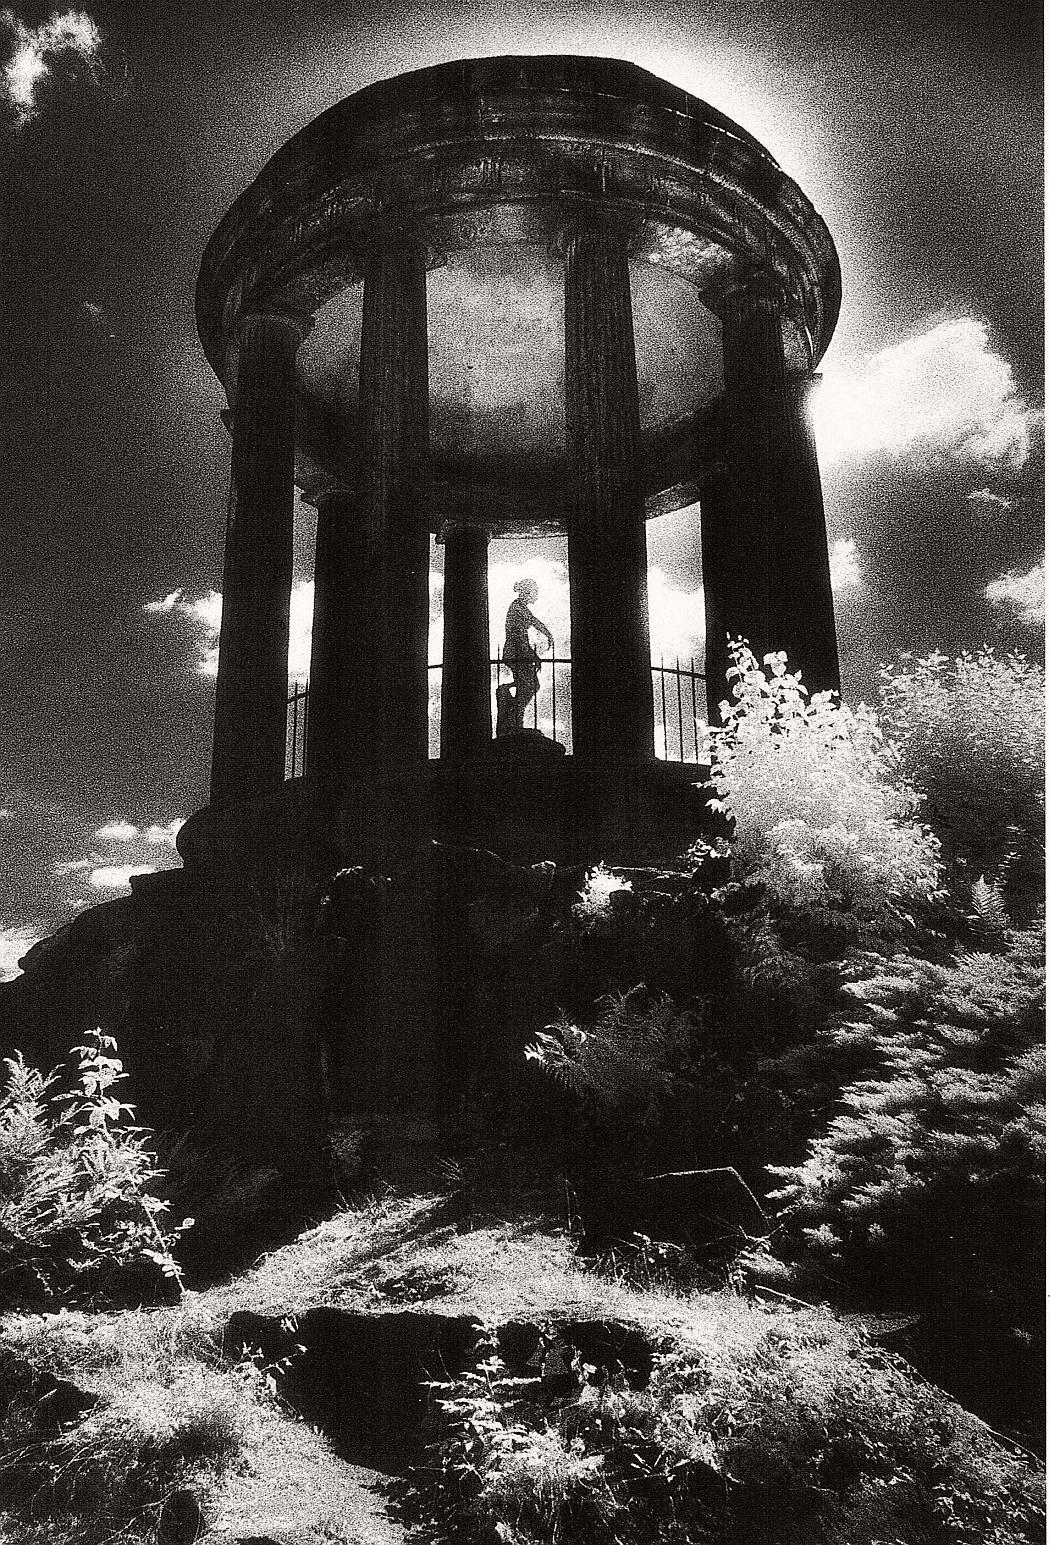 Biography: Surreal Architecture photographer Simon Marsden ...